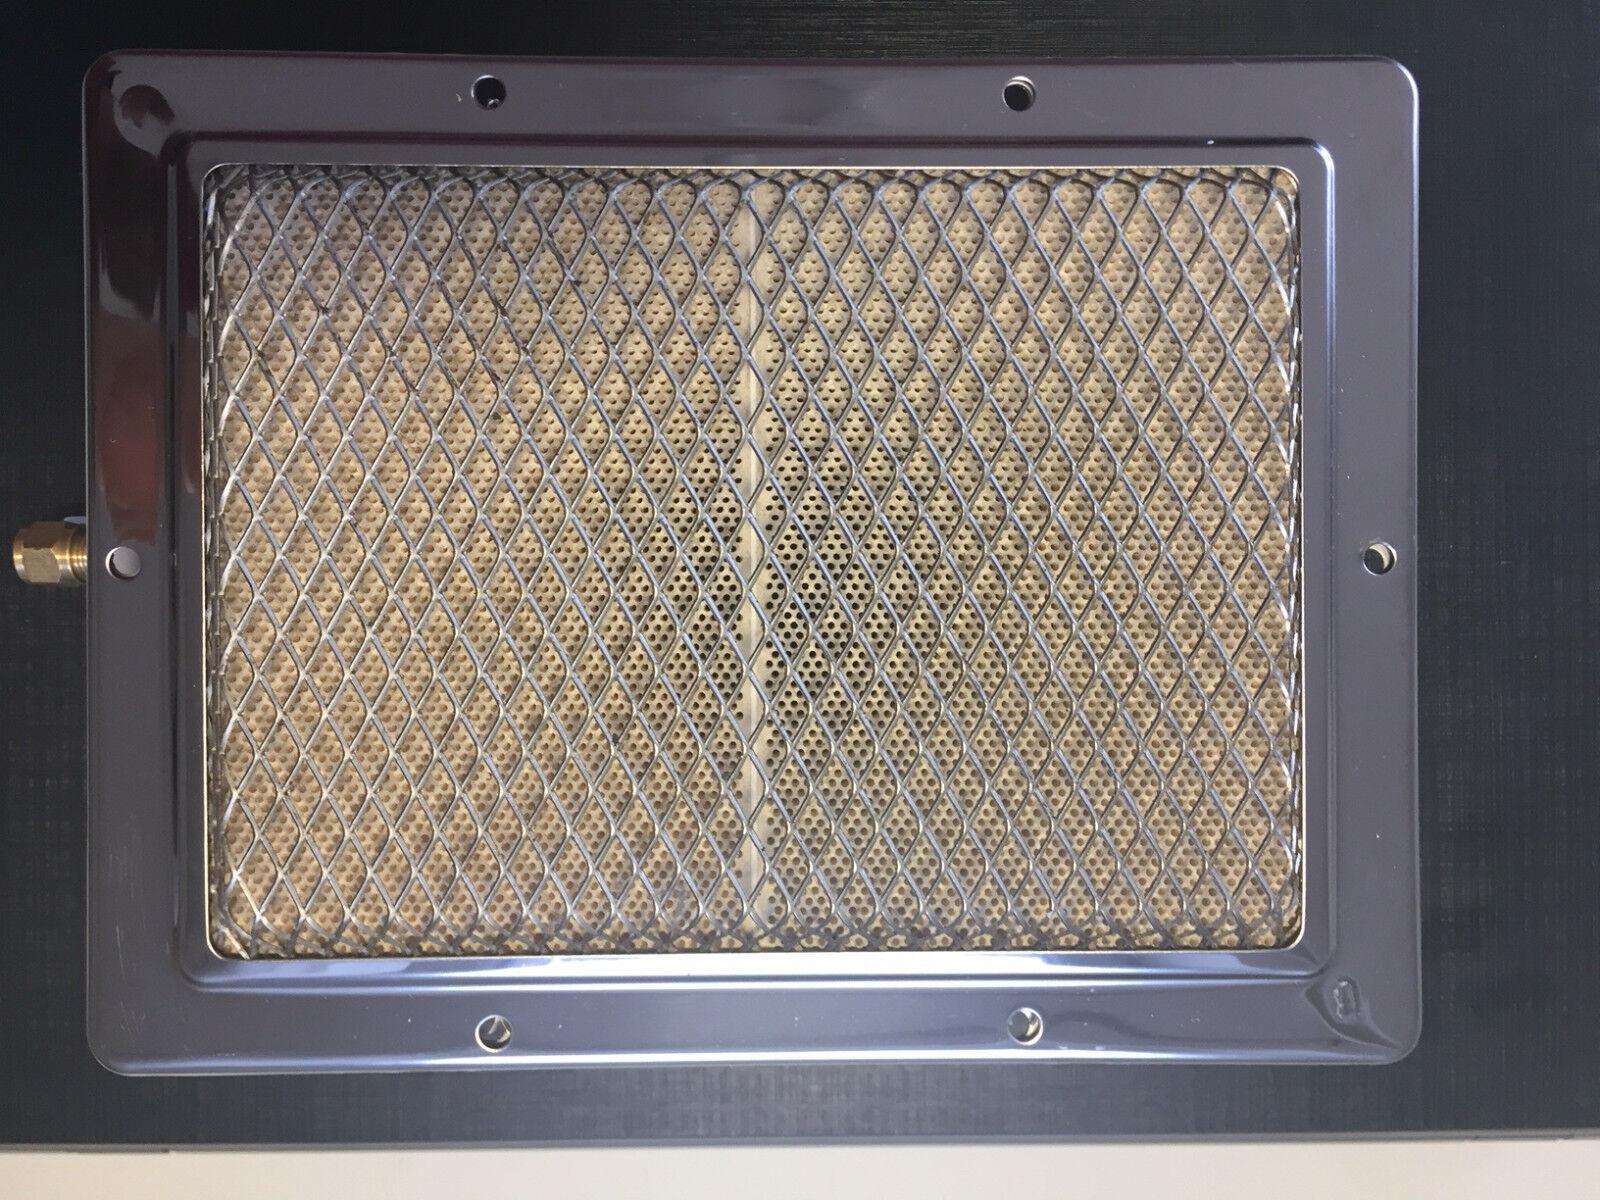 Keramik Holzkohlegrill Test : Grill ersatzteile test vergleich grill ersatzteile günstig kaufen